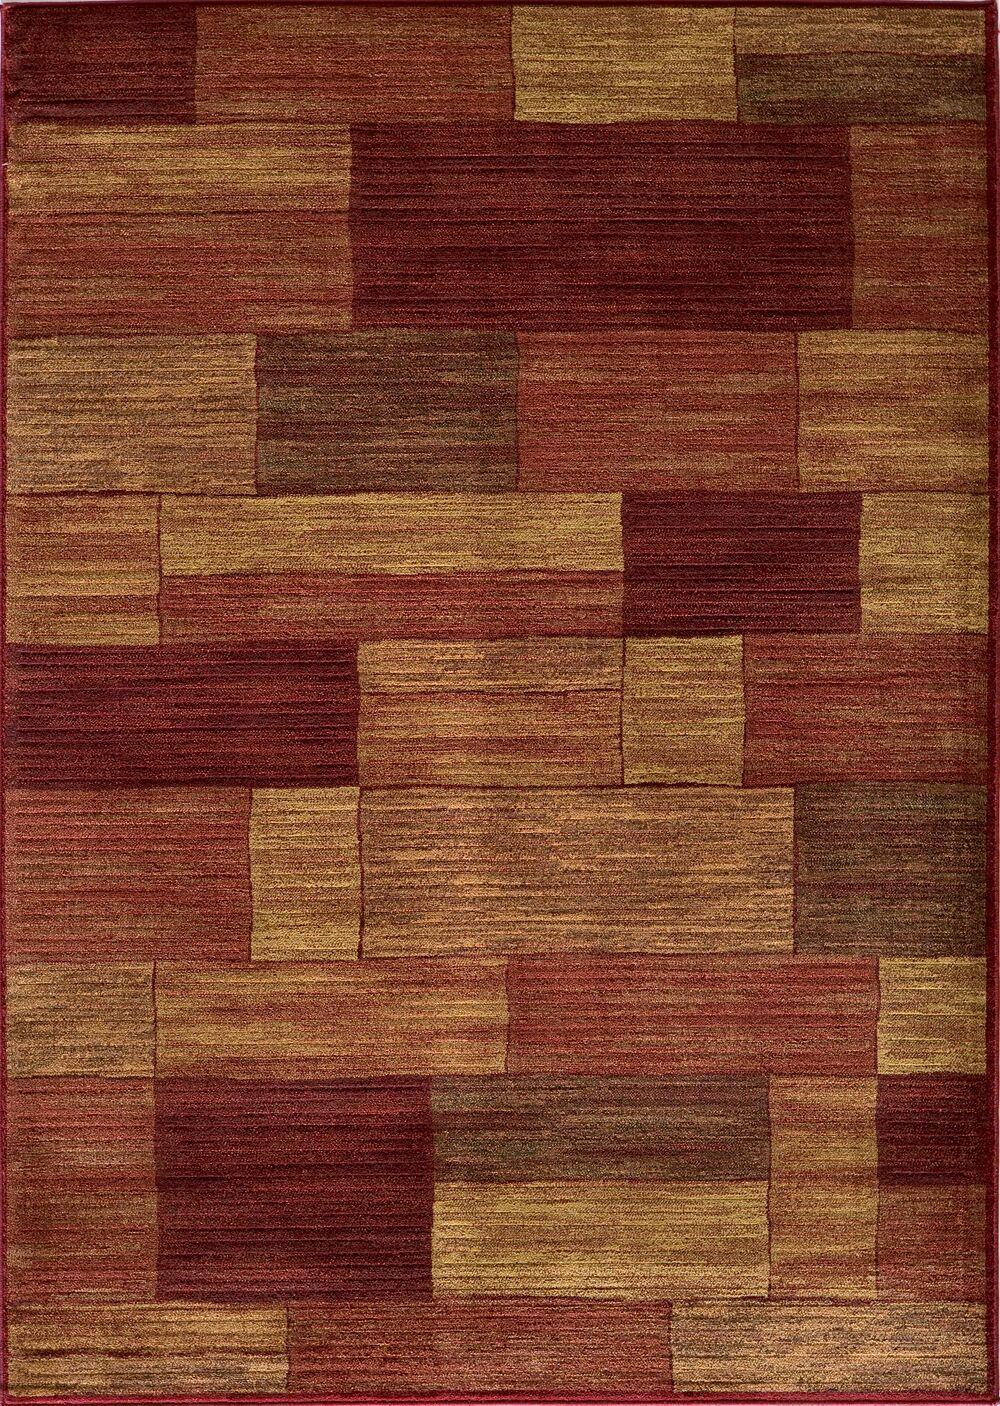 Sherill Burgundy/Beige Area Rug Rug Size: Rectangle 9'3